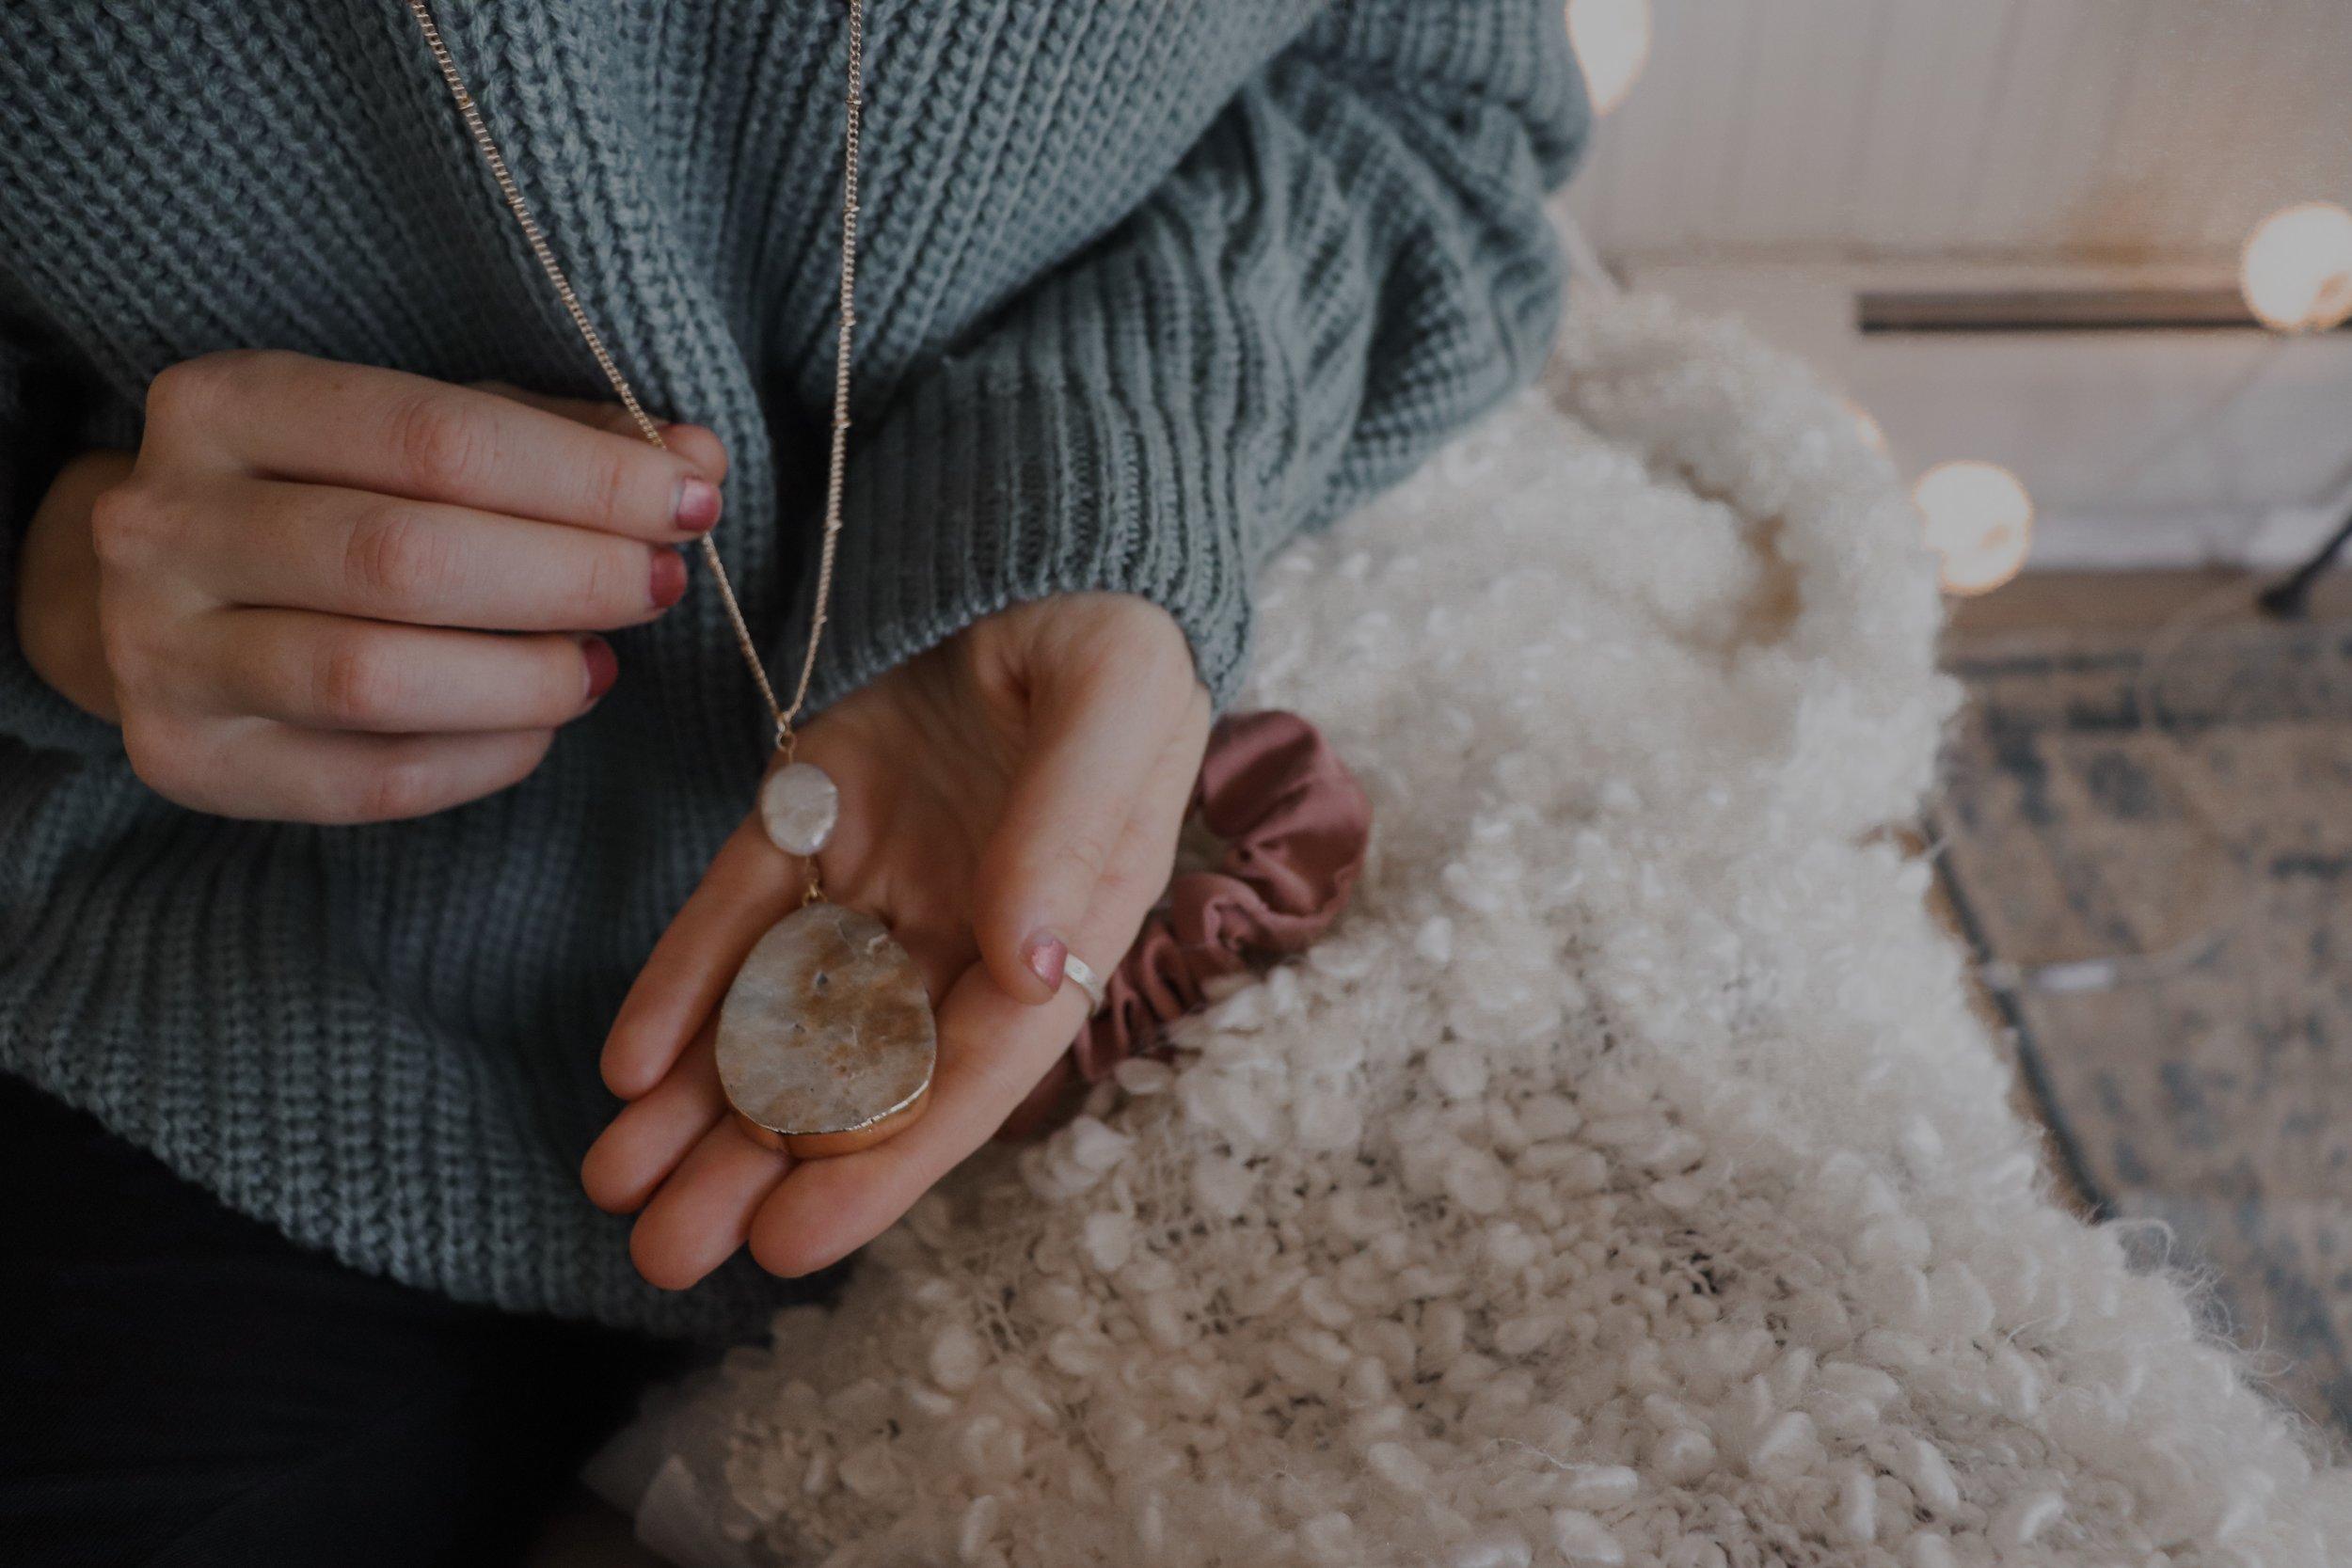 marisataylorjanenecklacesweaterholding